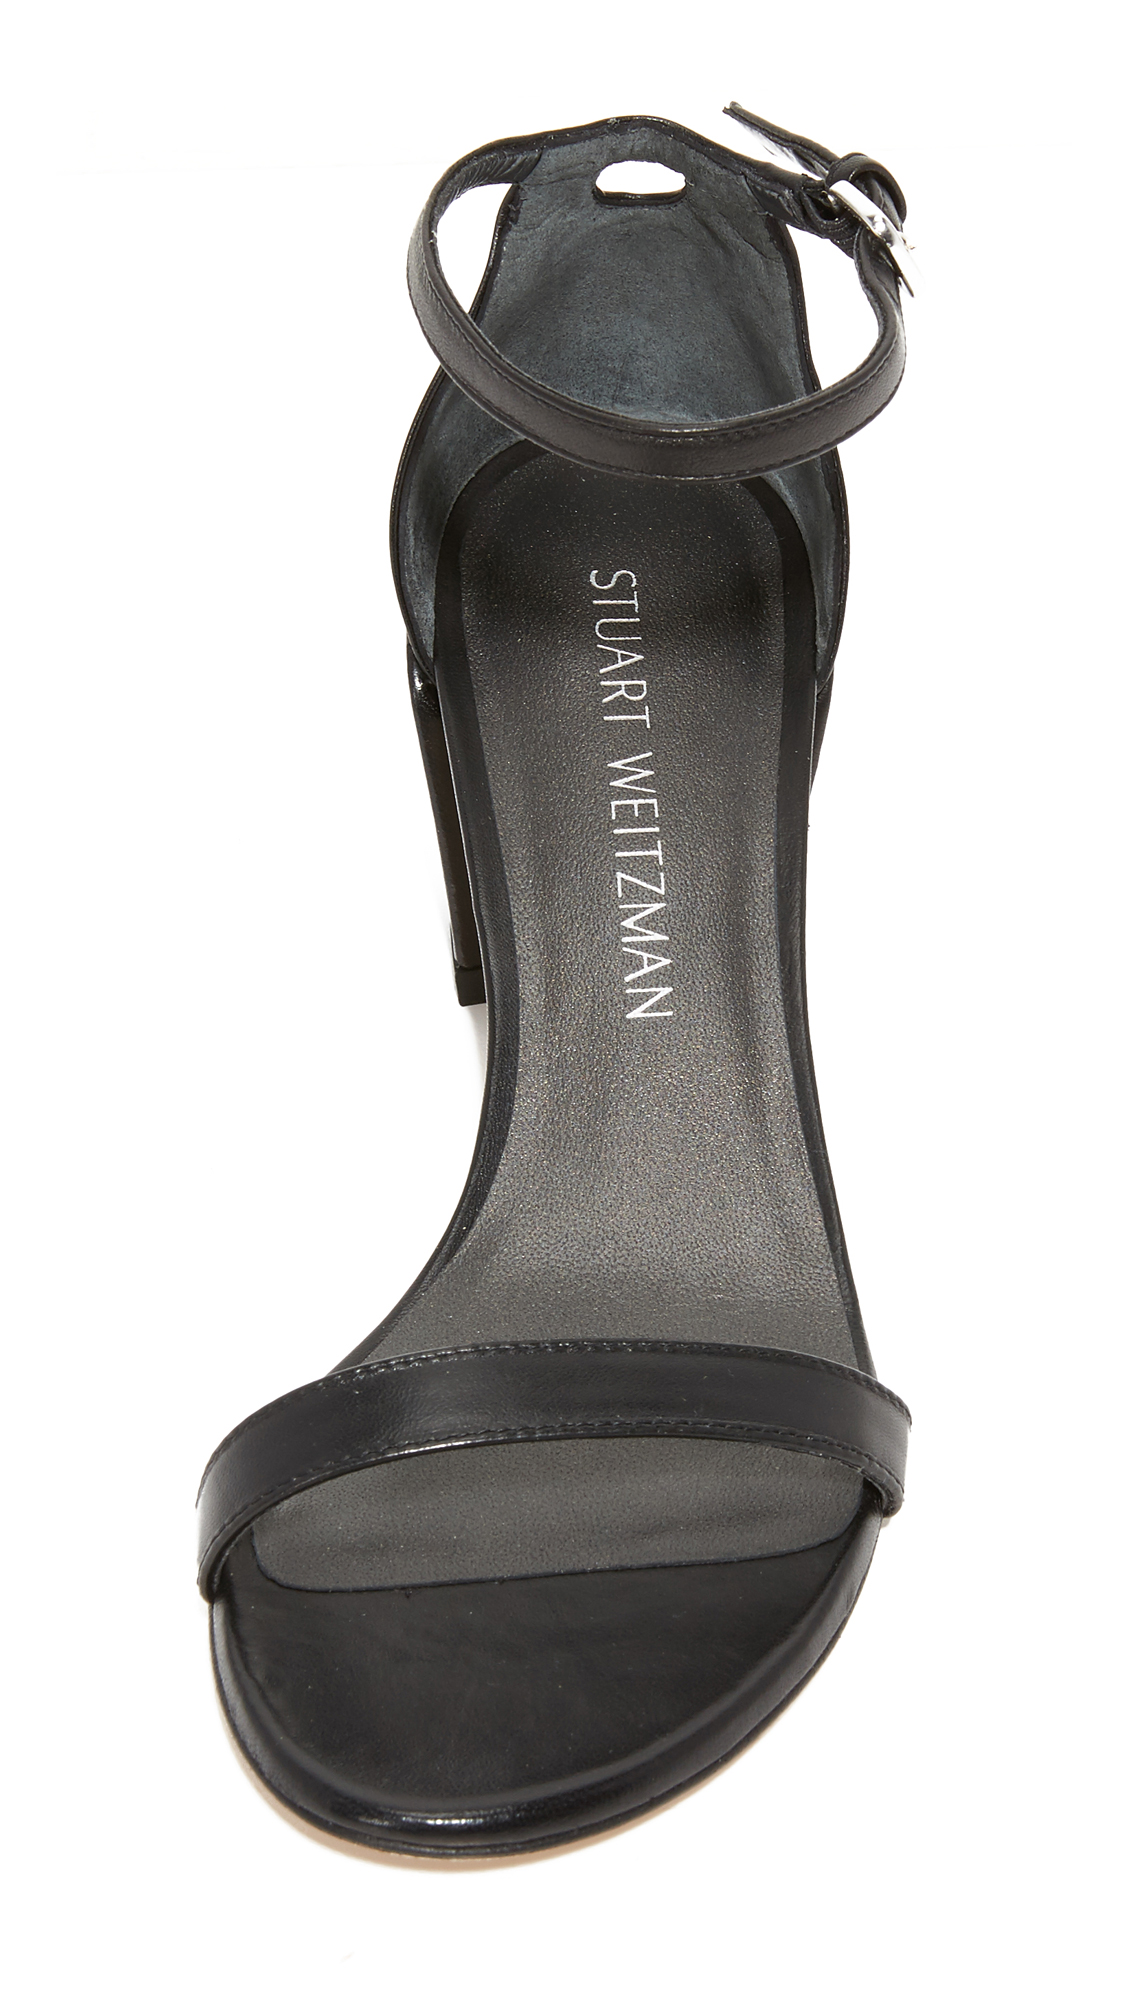 e69e5e85cc2e Stuart Weitzman Simple City Sandals